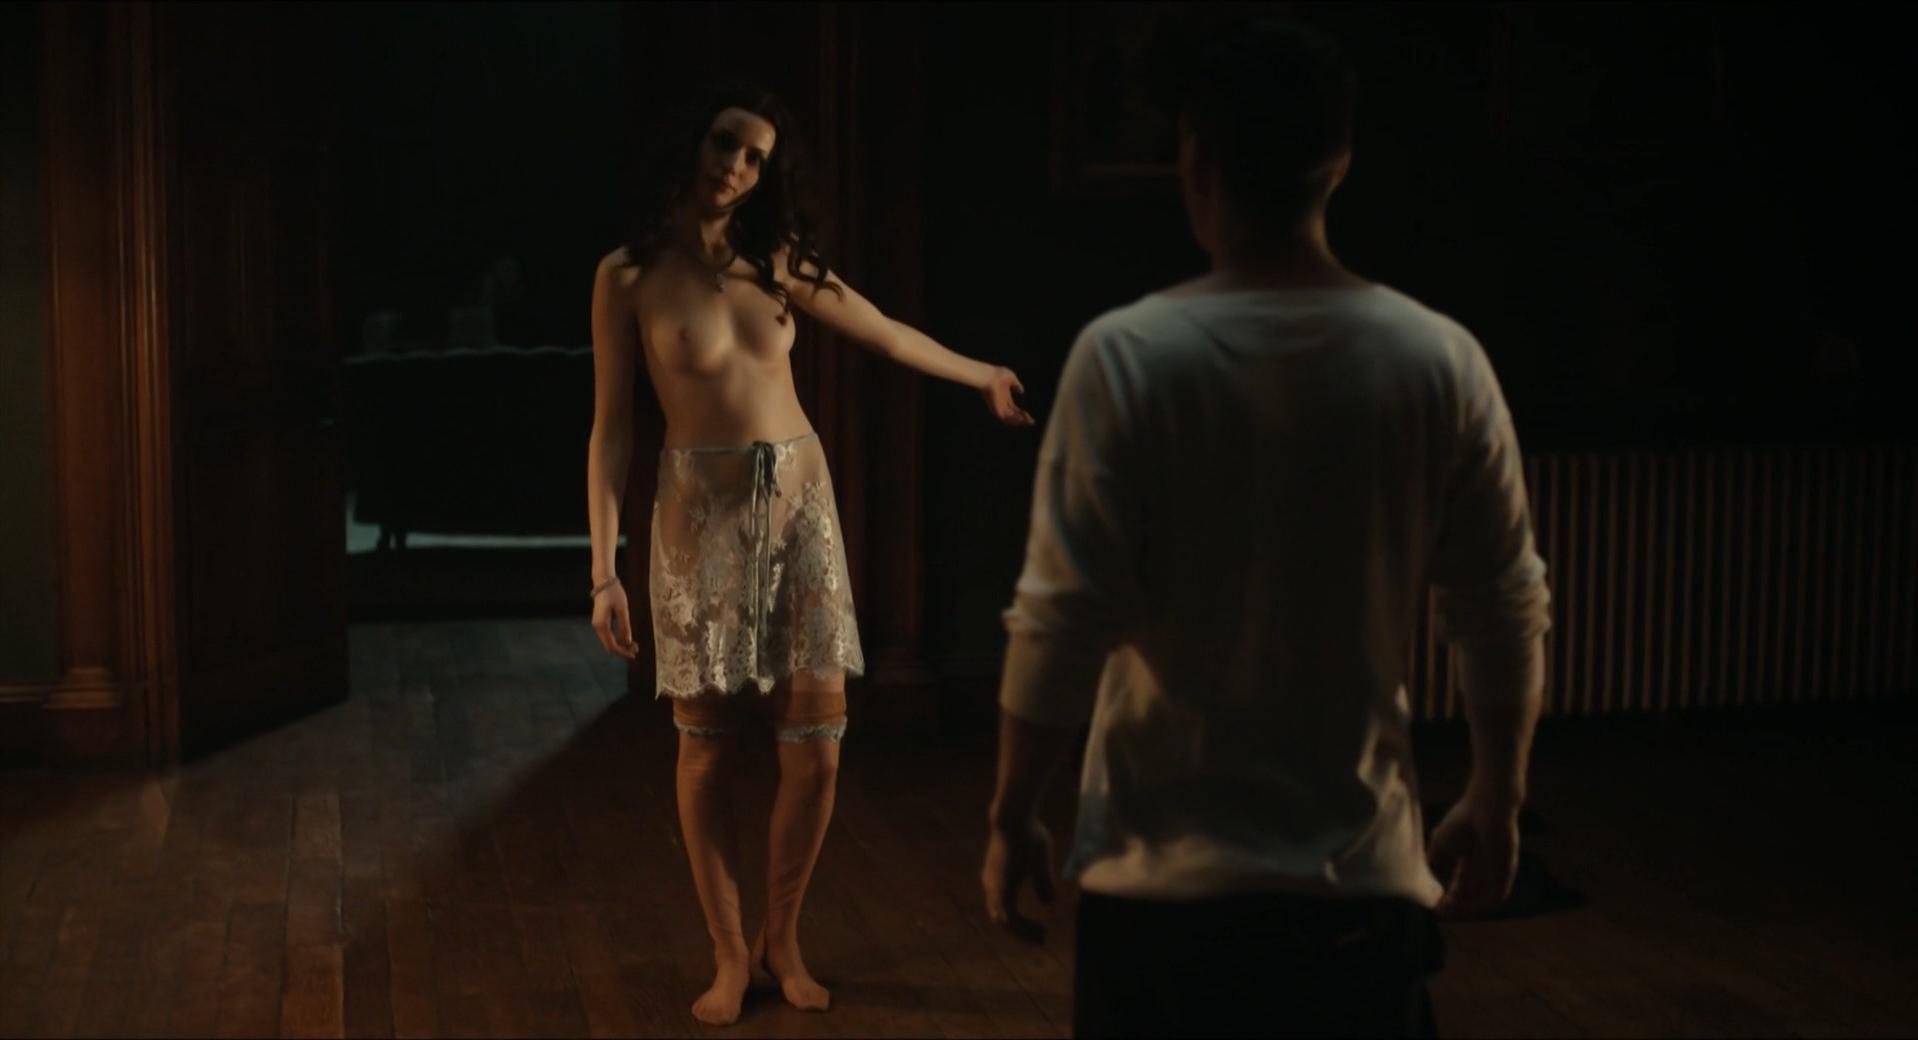 Gaite Jansen nude - Peaky Blinders s03e04 (2016)